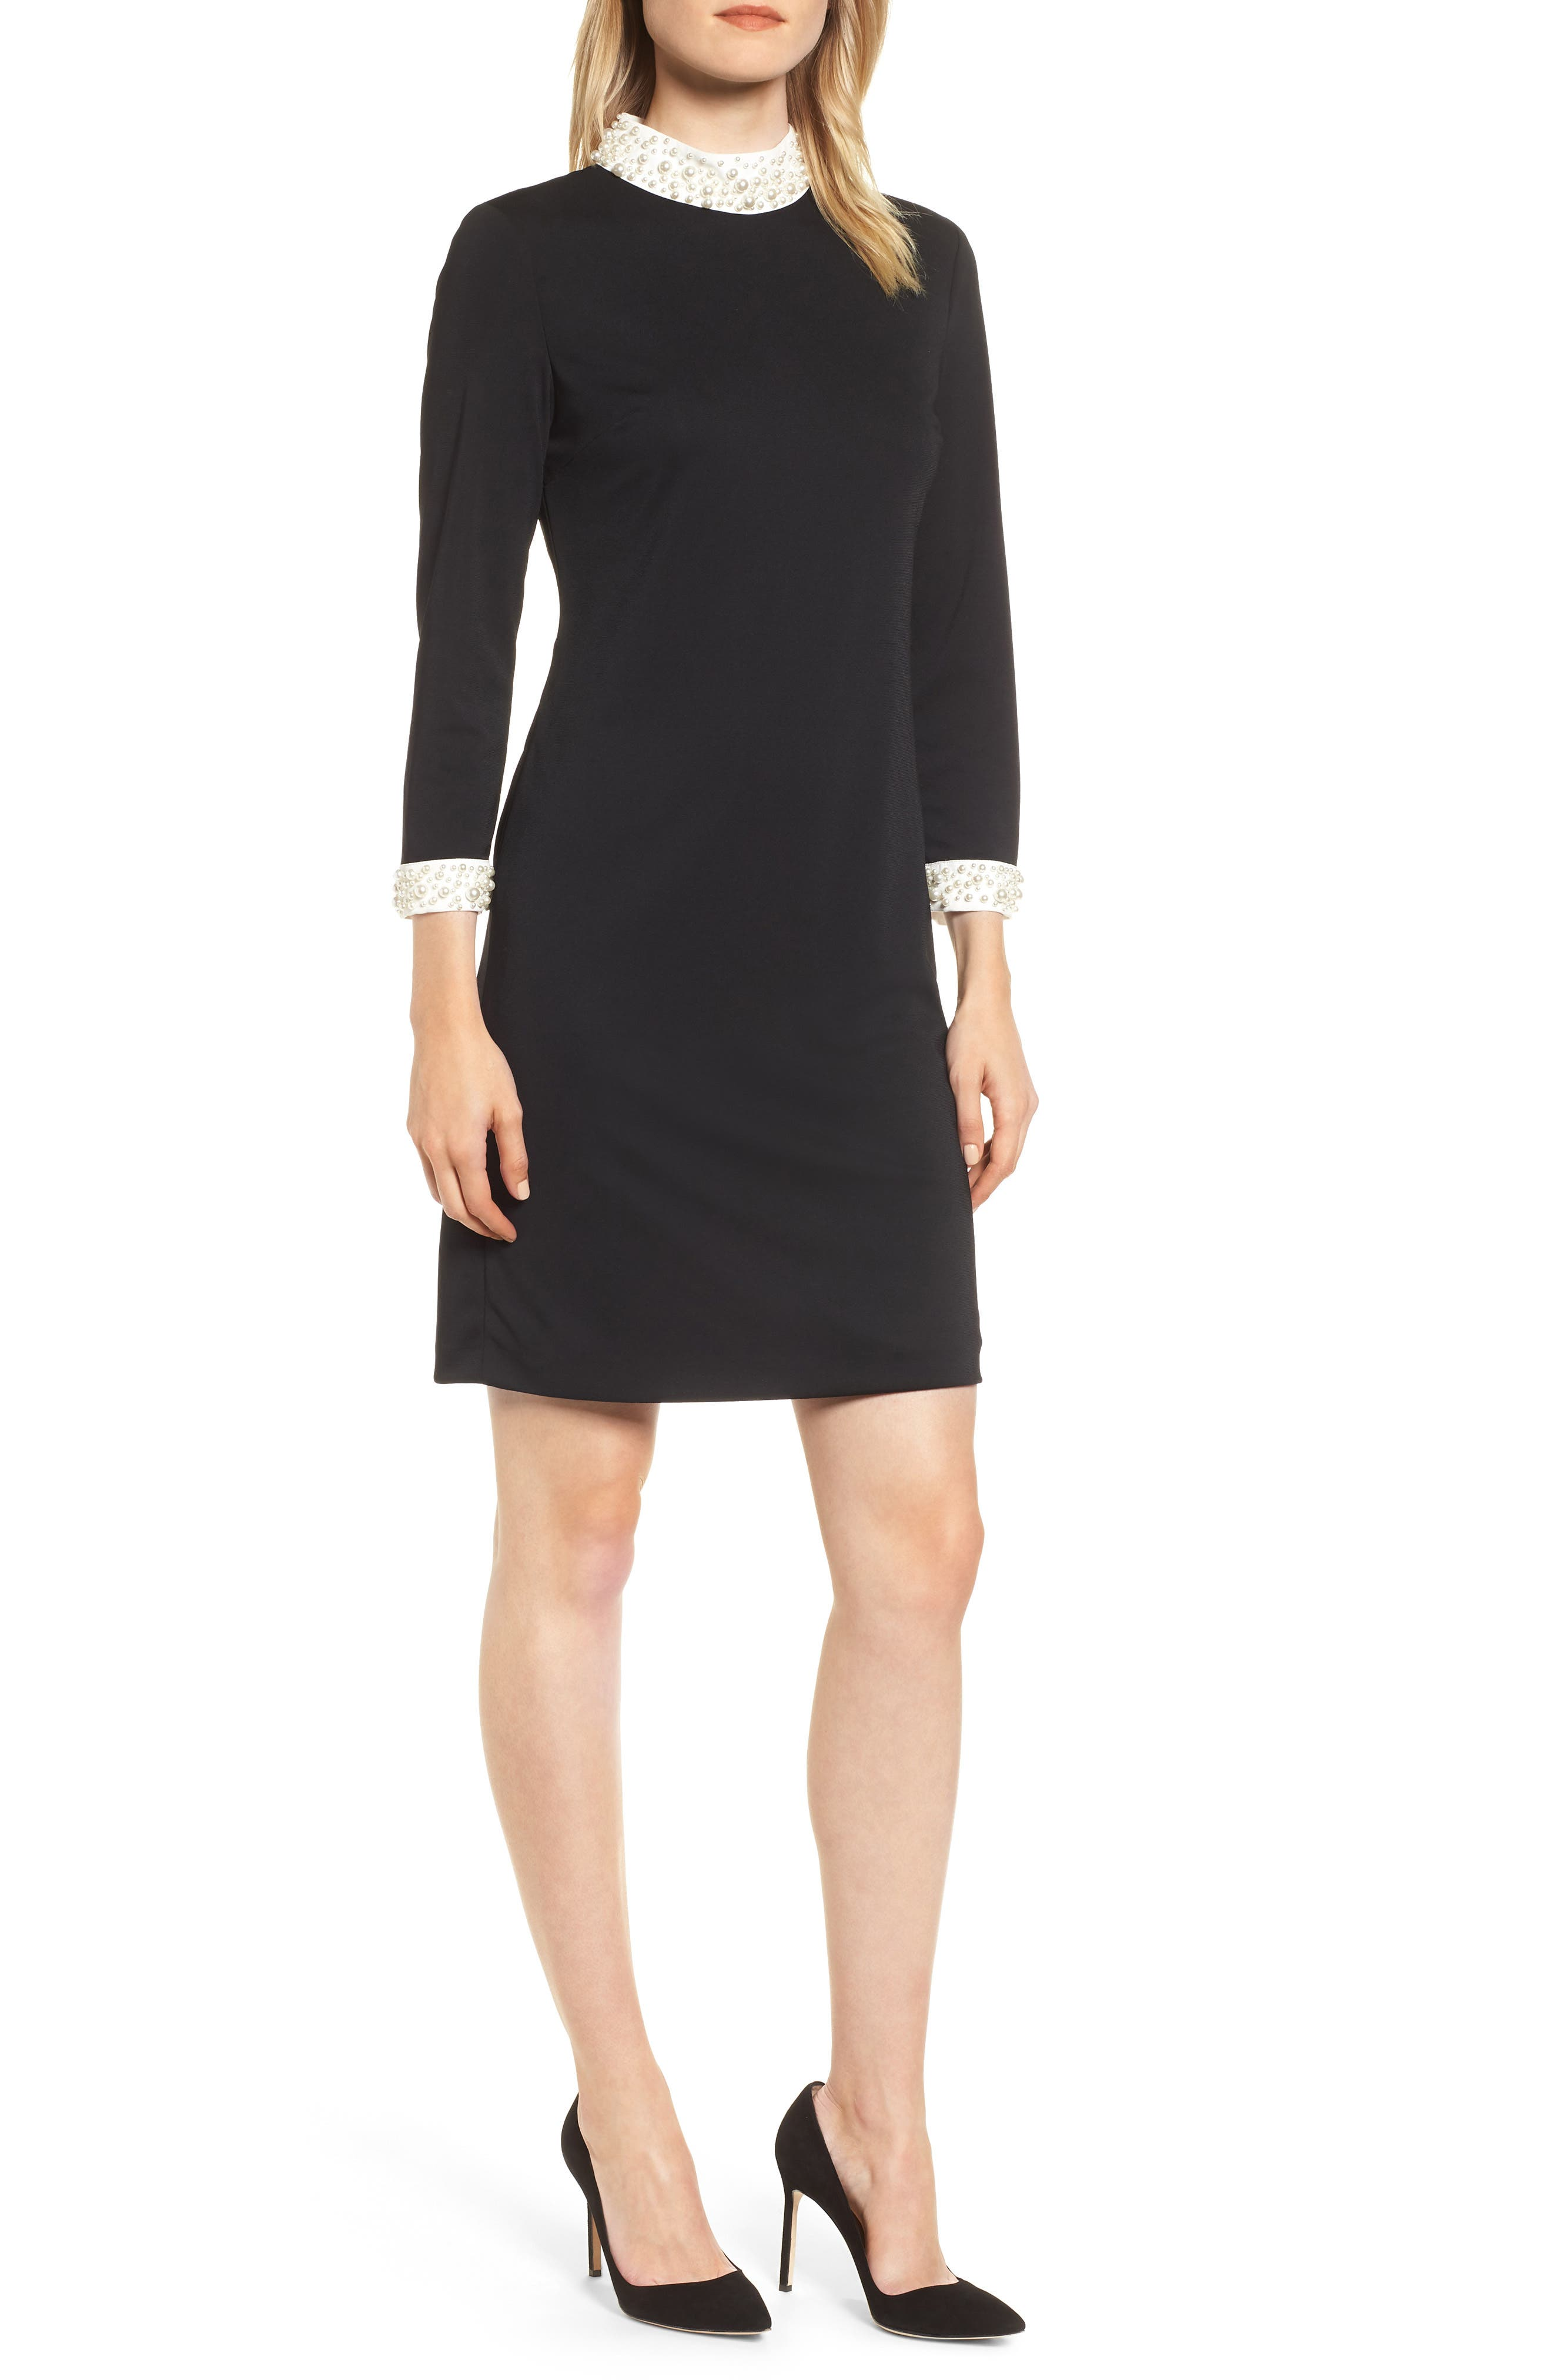 KARL LAGERFELD Pearly Detail High-Neck Sheath Dress in Black